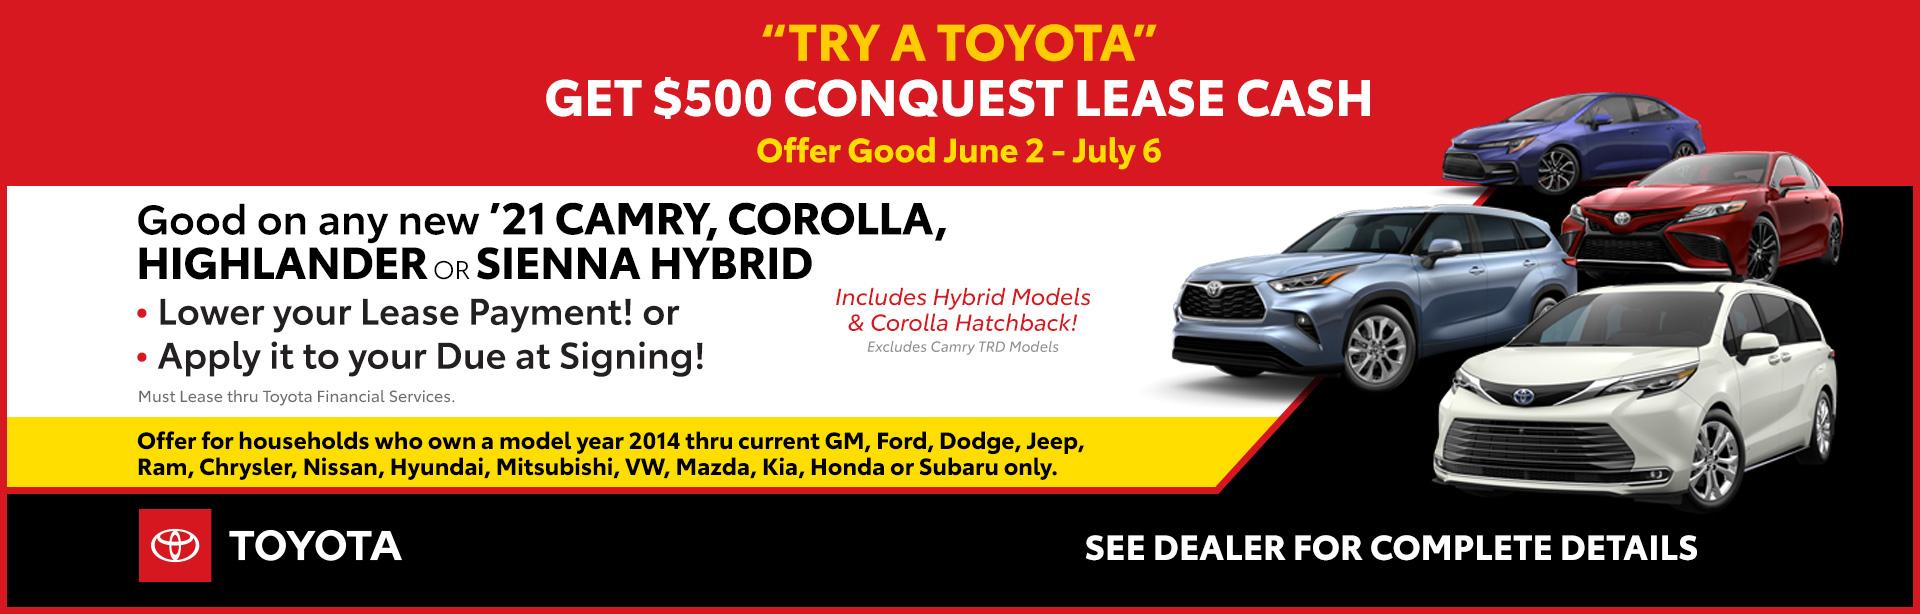 06-21_01_Cincinnati-June-2021-CIN-Conquest_1920x614_3b9e_Camry-Camry-Hybrid-Corolla-Hatchback-Corolla-Highlander-Highlander-Hybrid-Sienna-Corolla-Hybrid_O_xta.jpeg